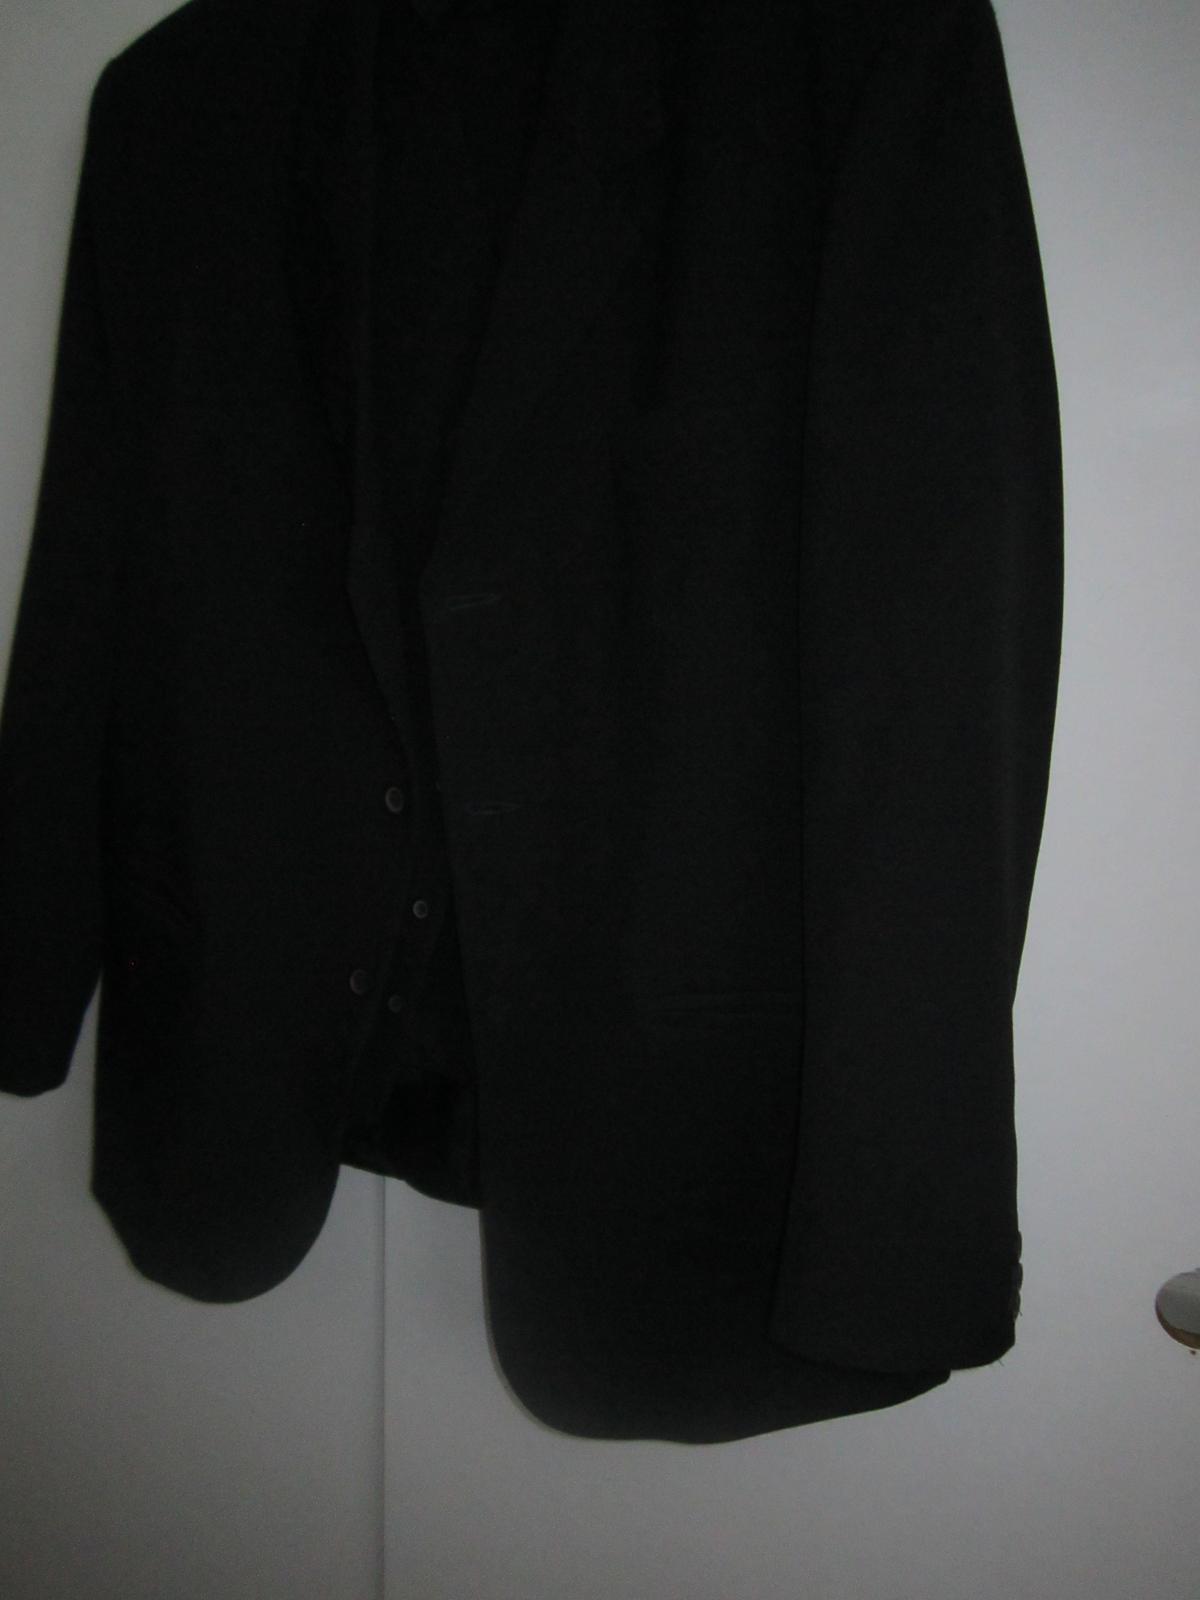 1605. Čierny oblek - Obrázok č. 1